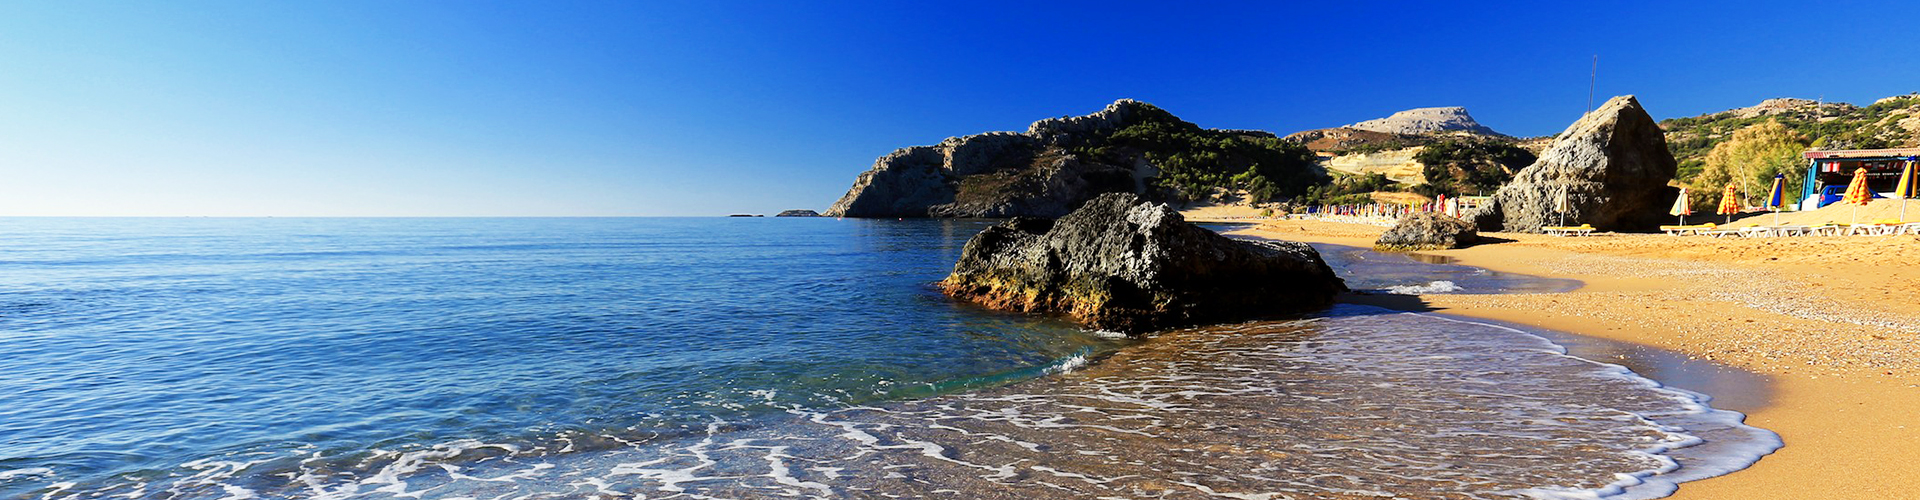 THE UNIQUE TSAMPIKA BEACH